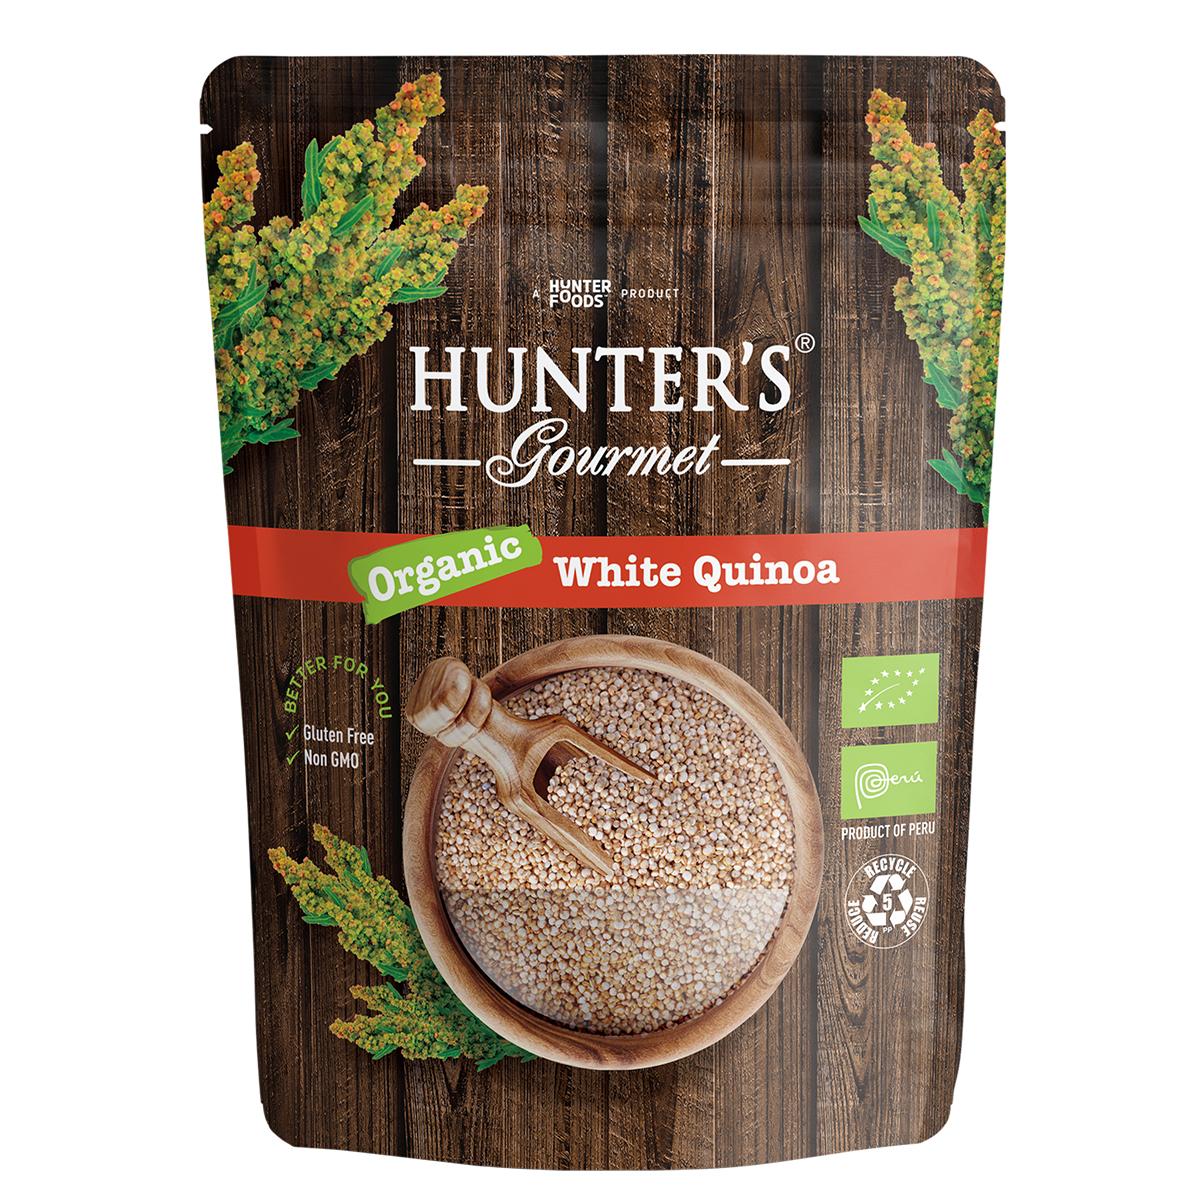 Hunter's Gourmet Organic Wheatgrass Powder (250gm)